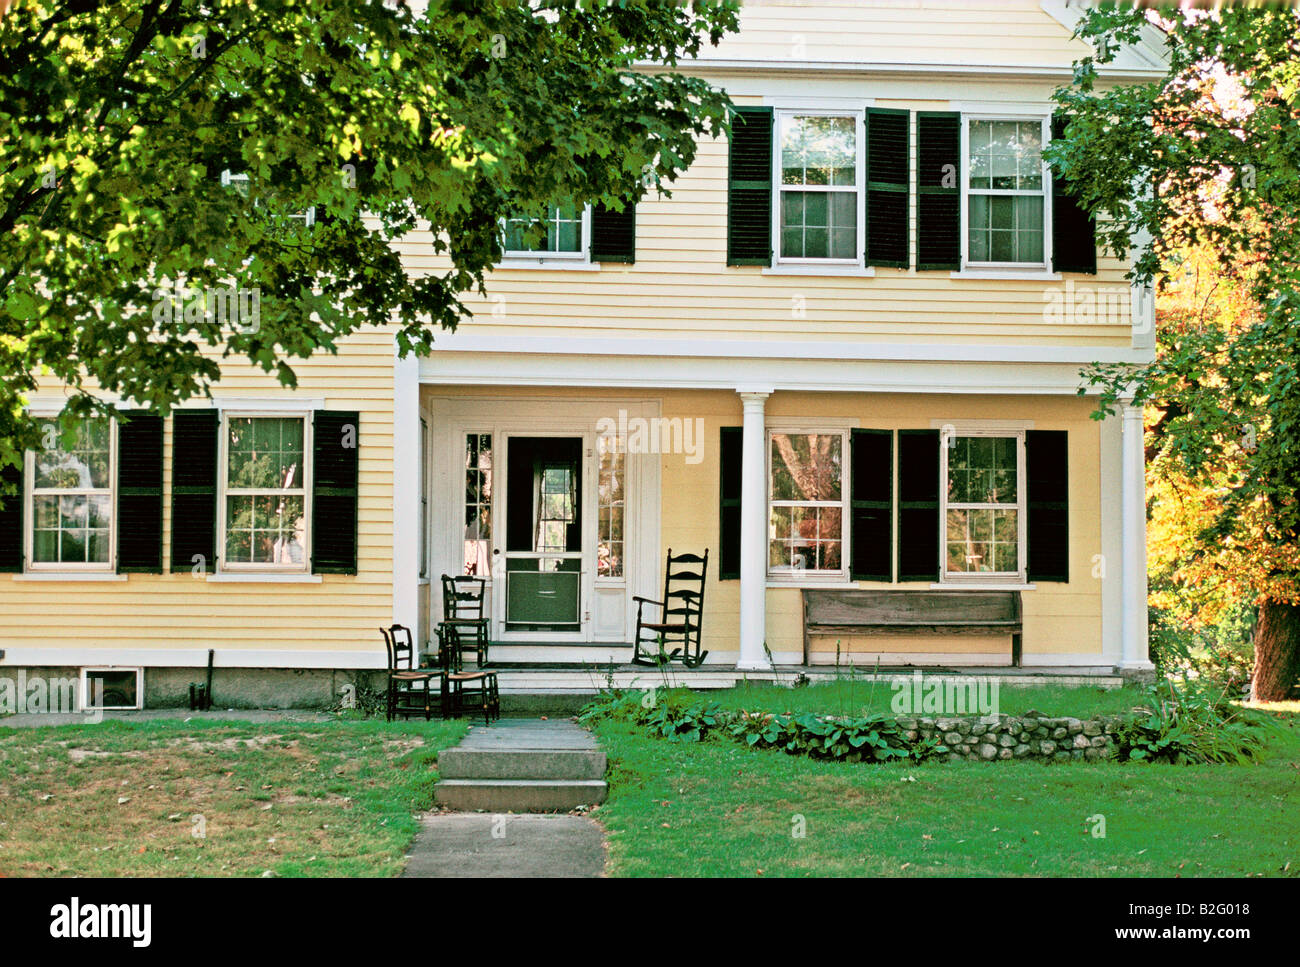 veranda of a suburban house in new england - Stock Image